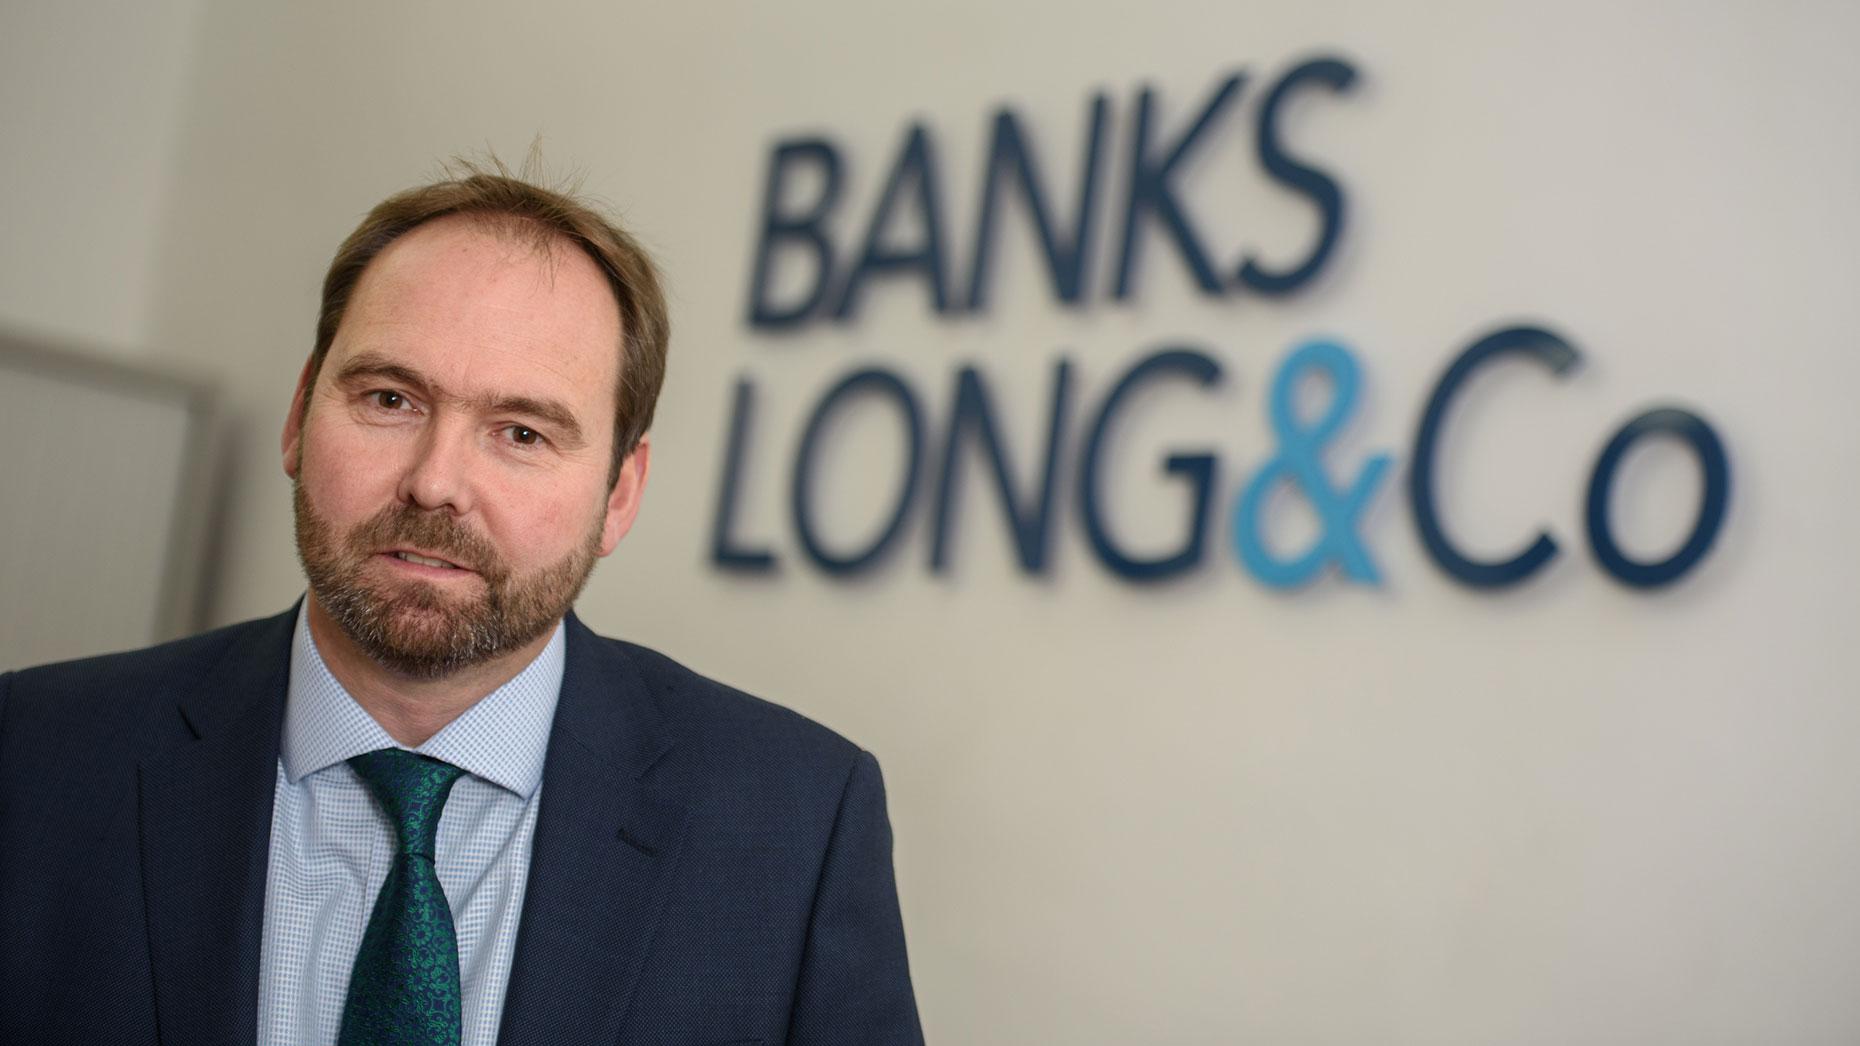 Tim Bradford, Managing Director of Banks Long & Co. Photo: Steve Smailes